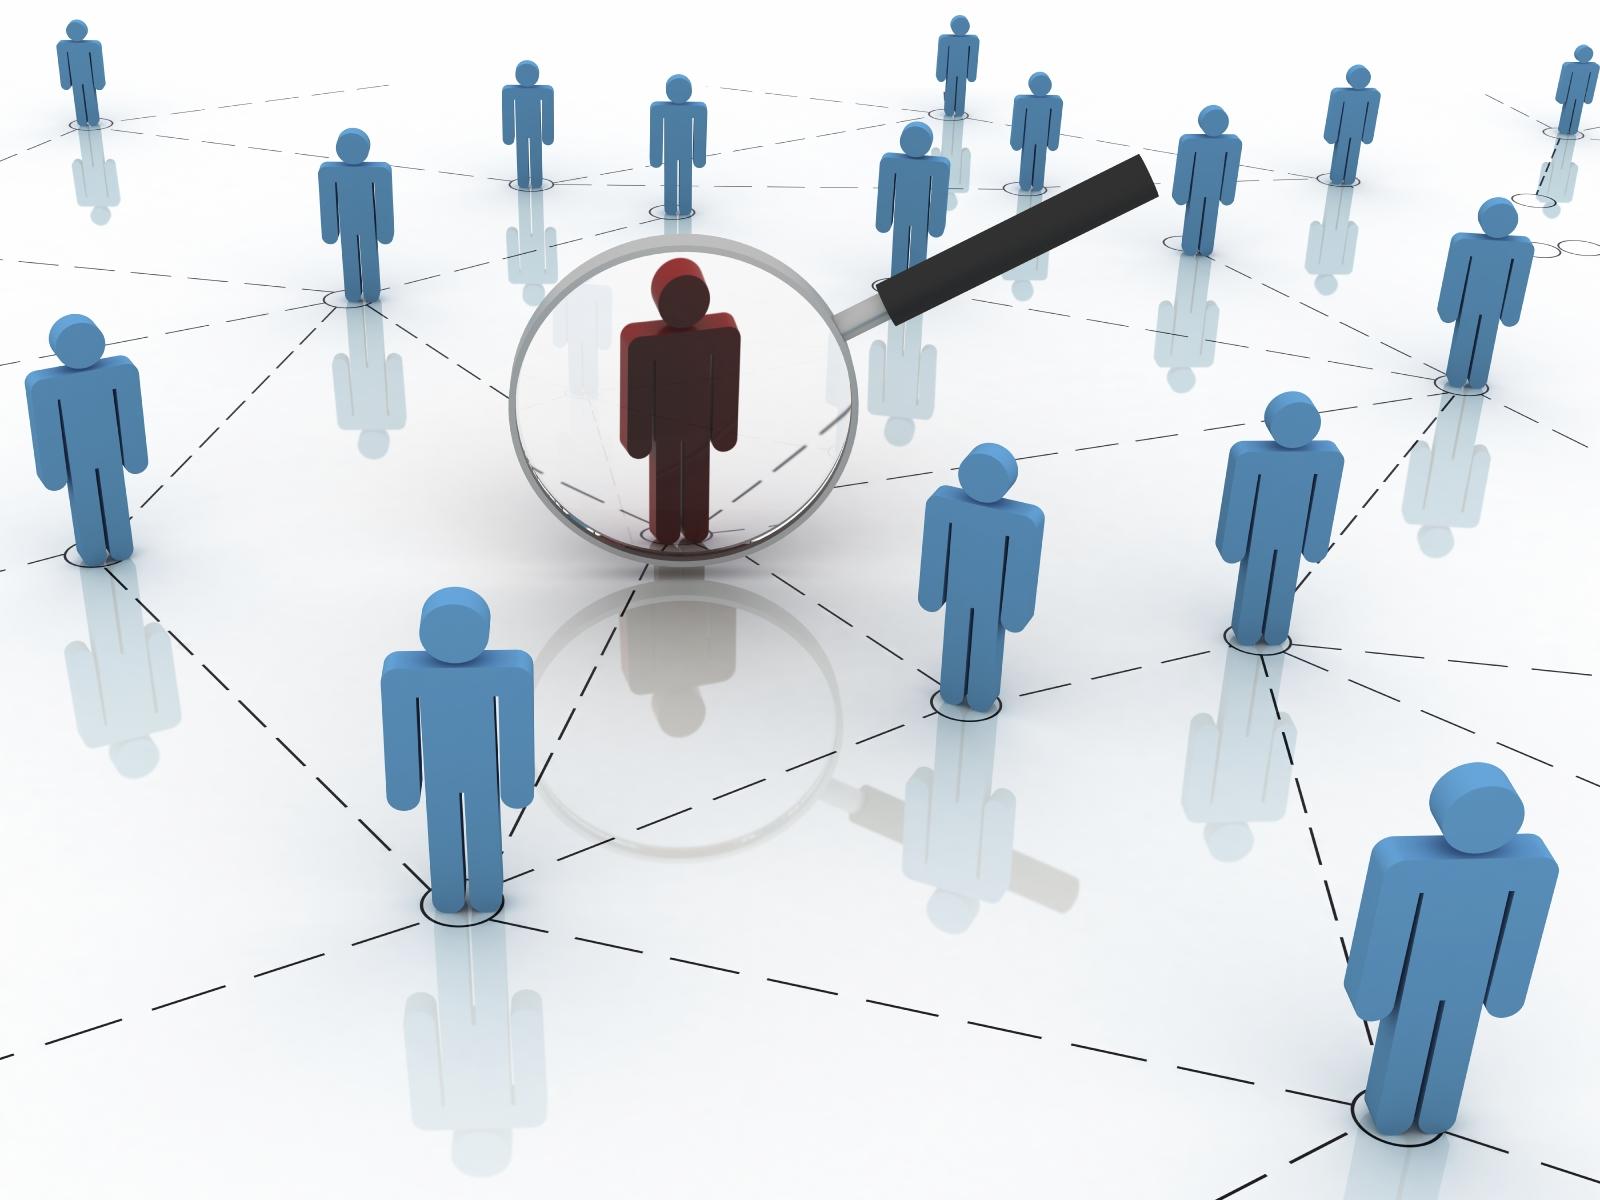 Azienda, proposta di valore, user experience, web strategies, è sempre una questione di persone